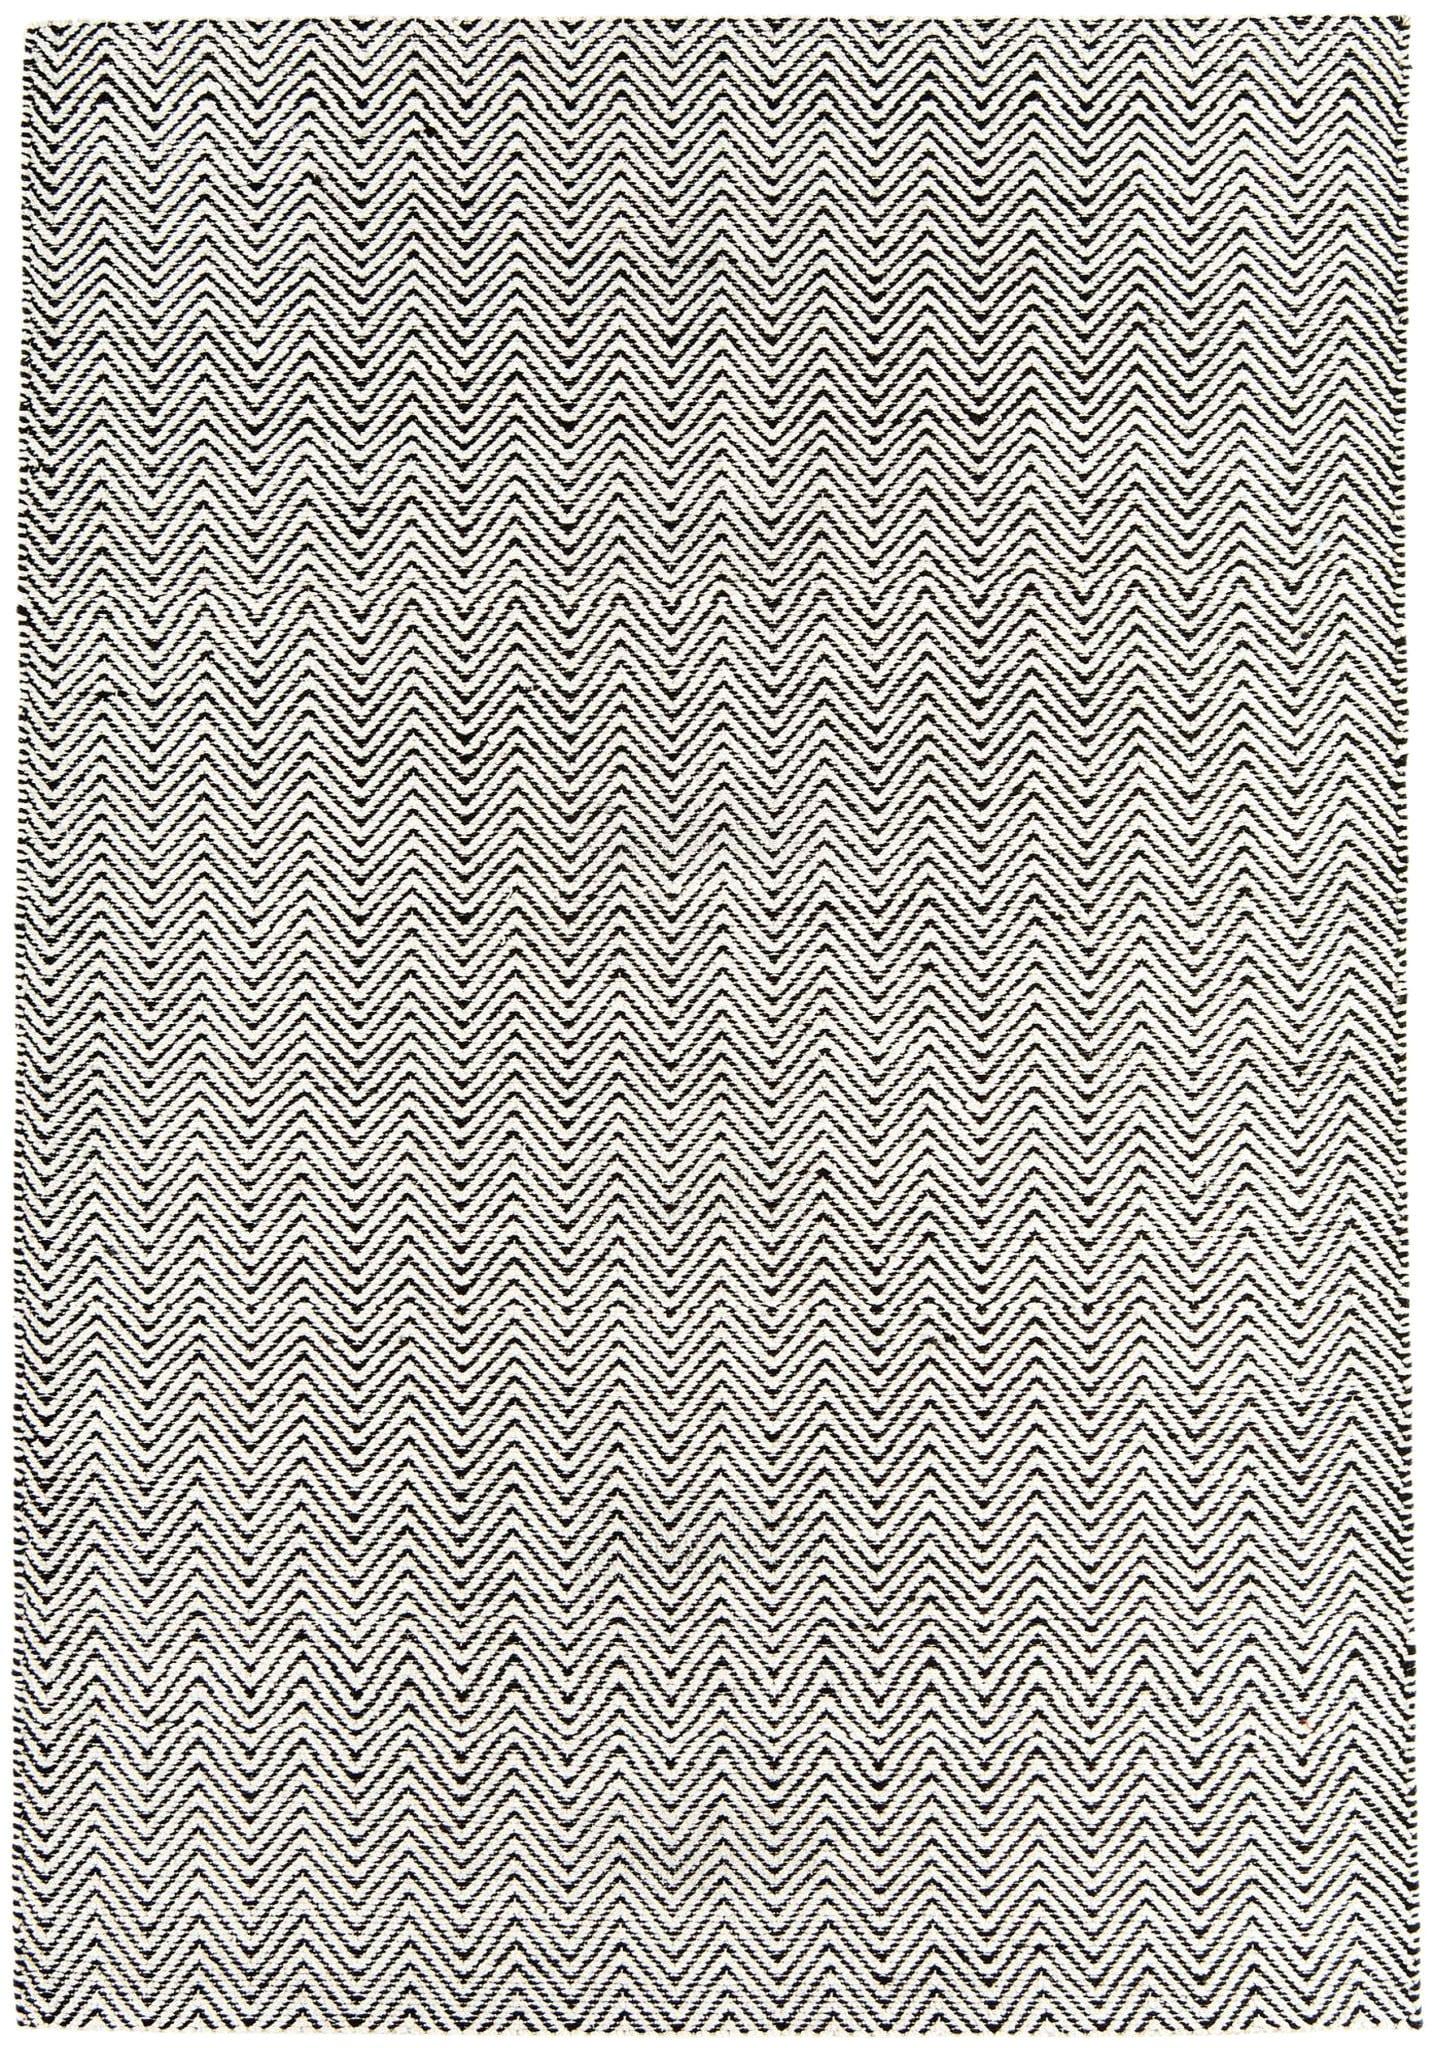 Asiatic Carpets Colour Black White